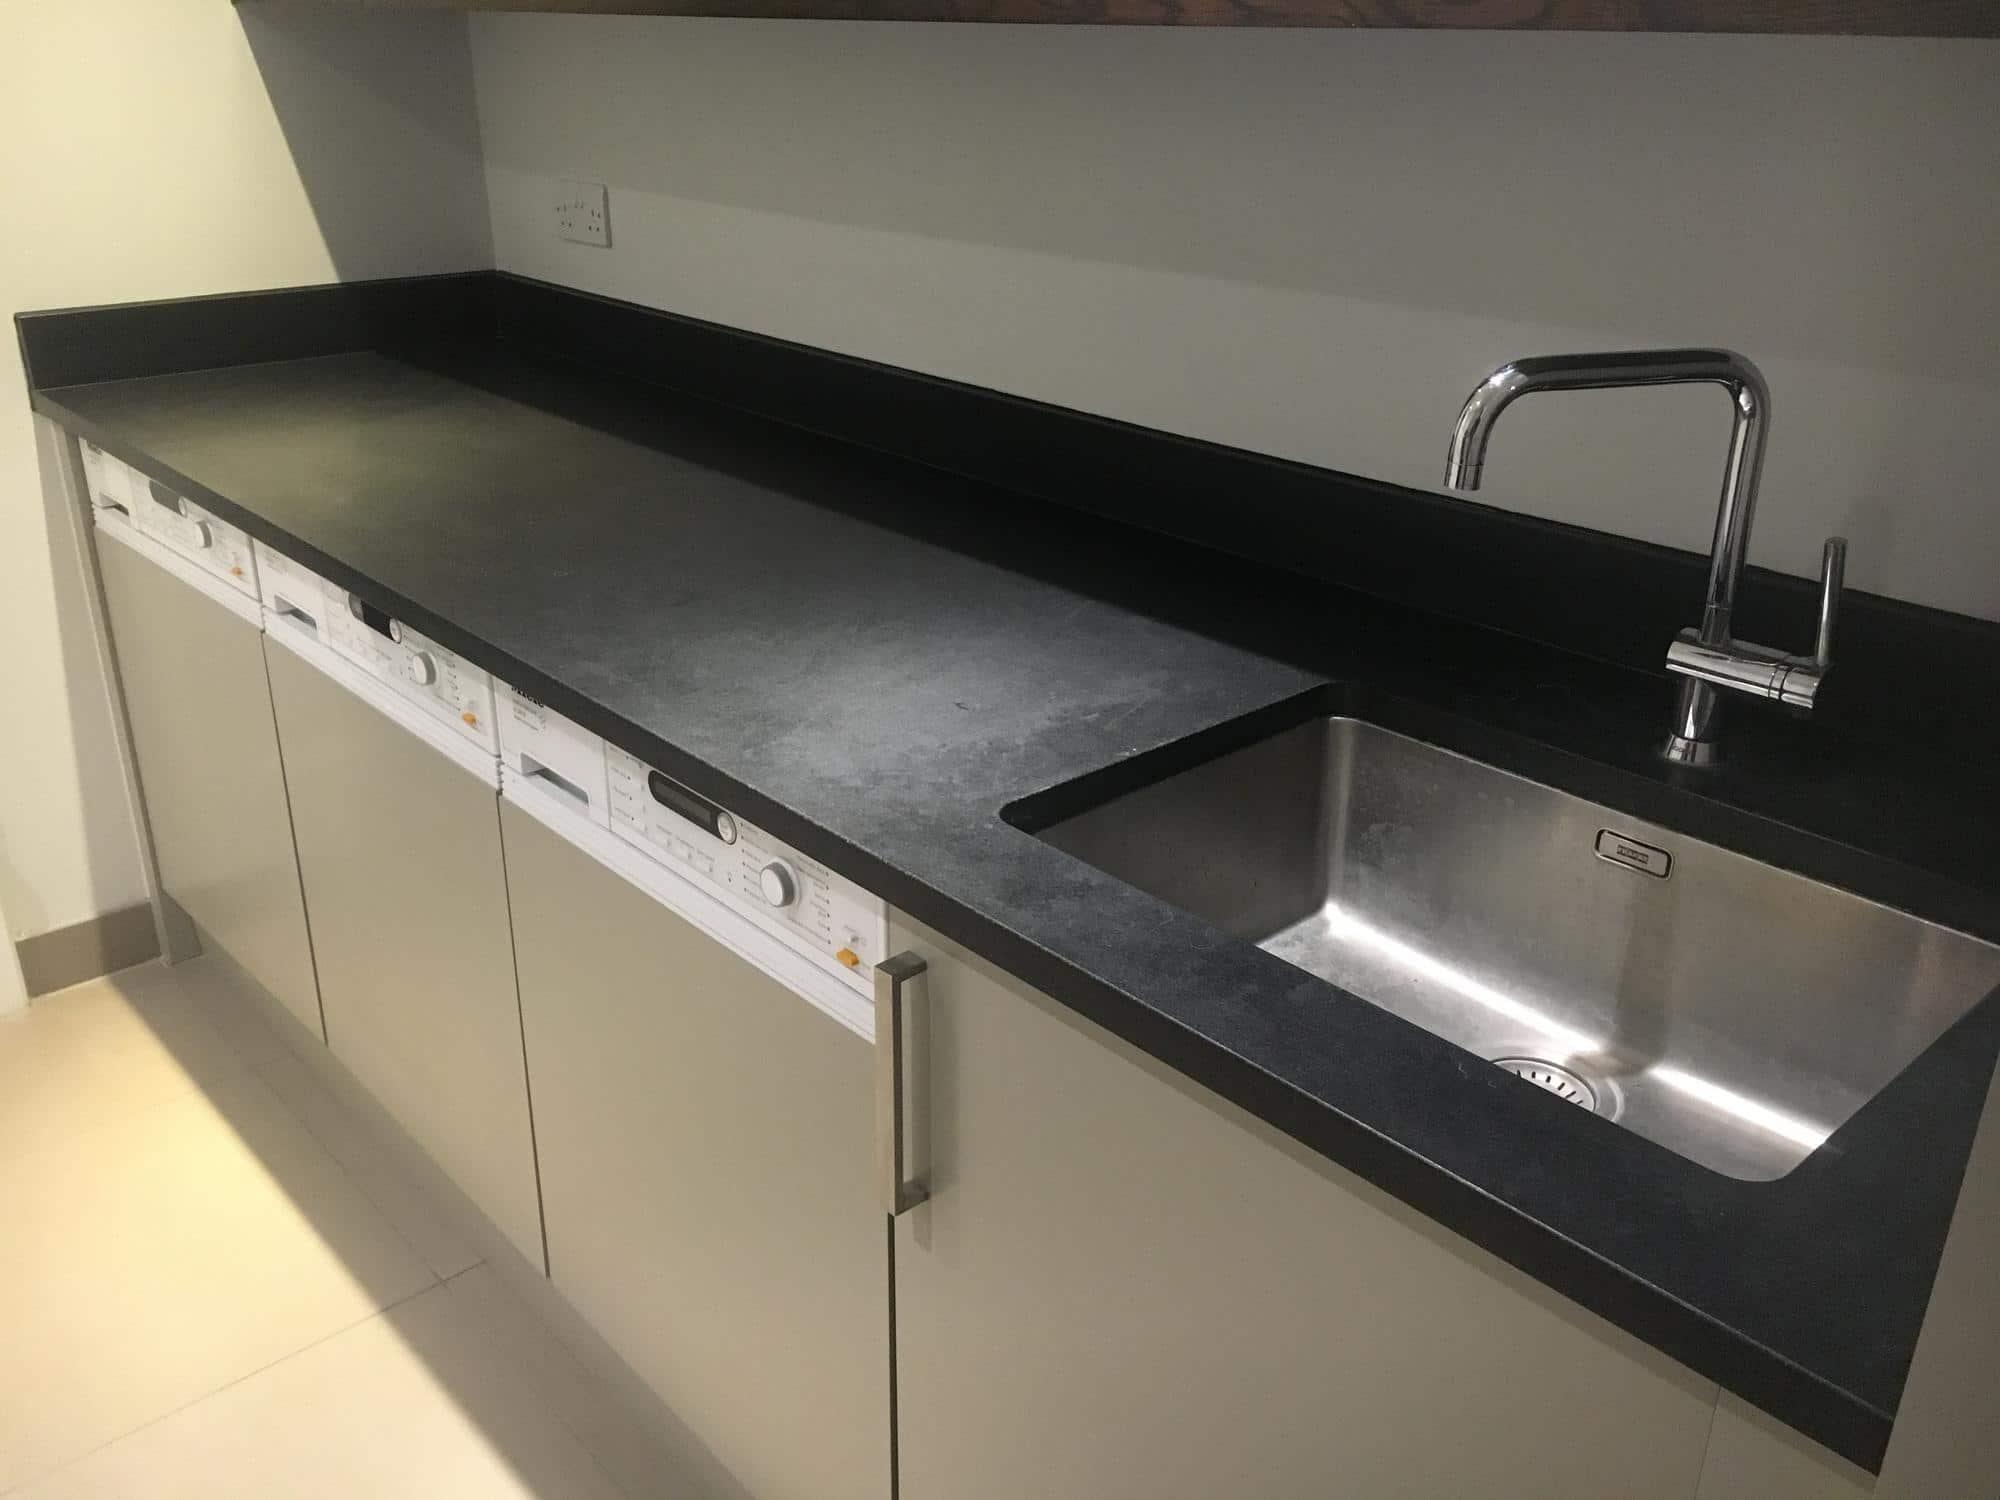 Black granite detergent stain removal | Bespoke Repairs